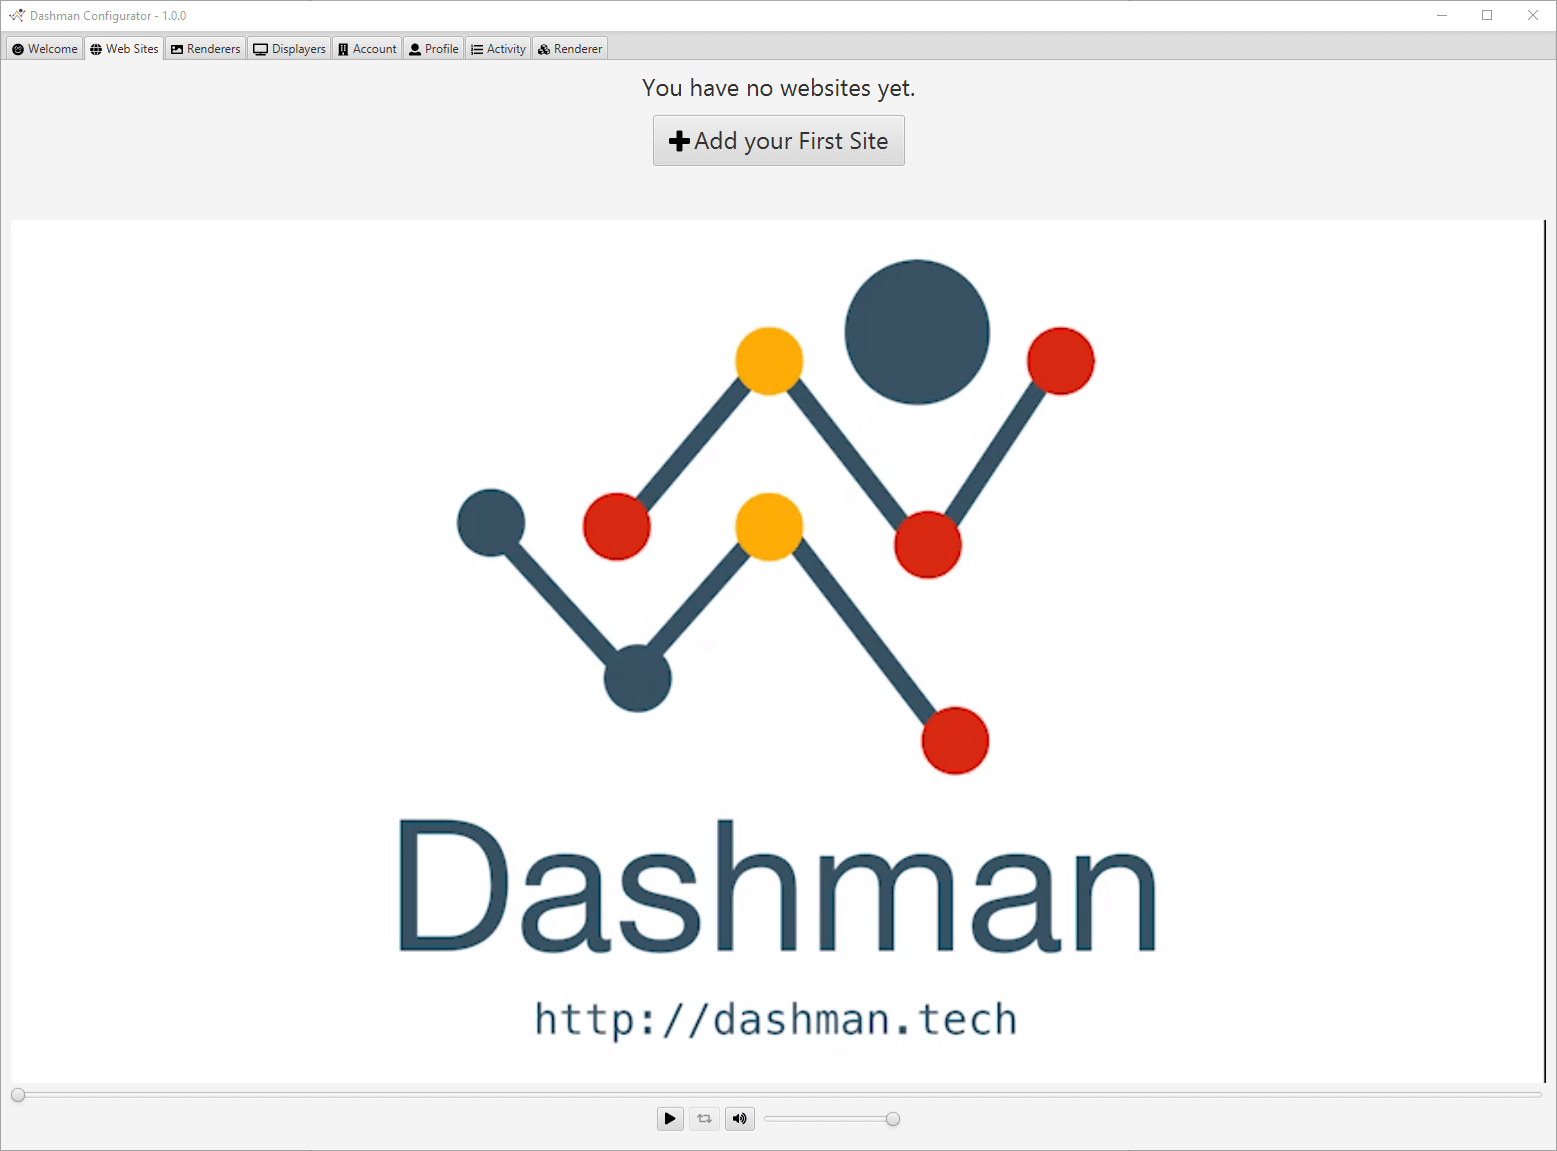 Dashman - web-sites